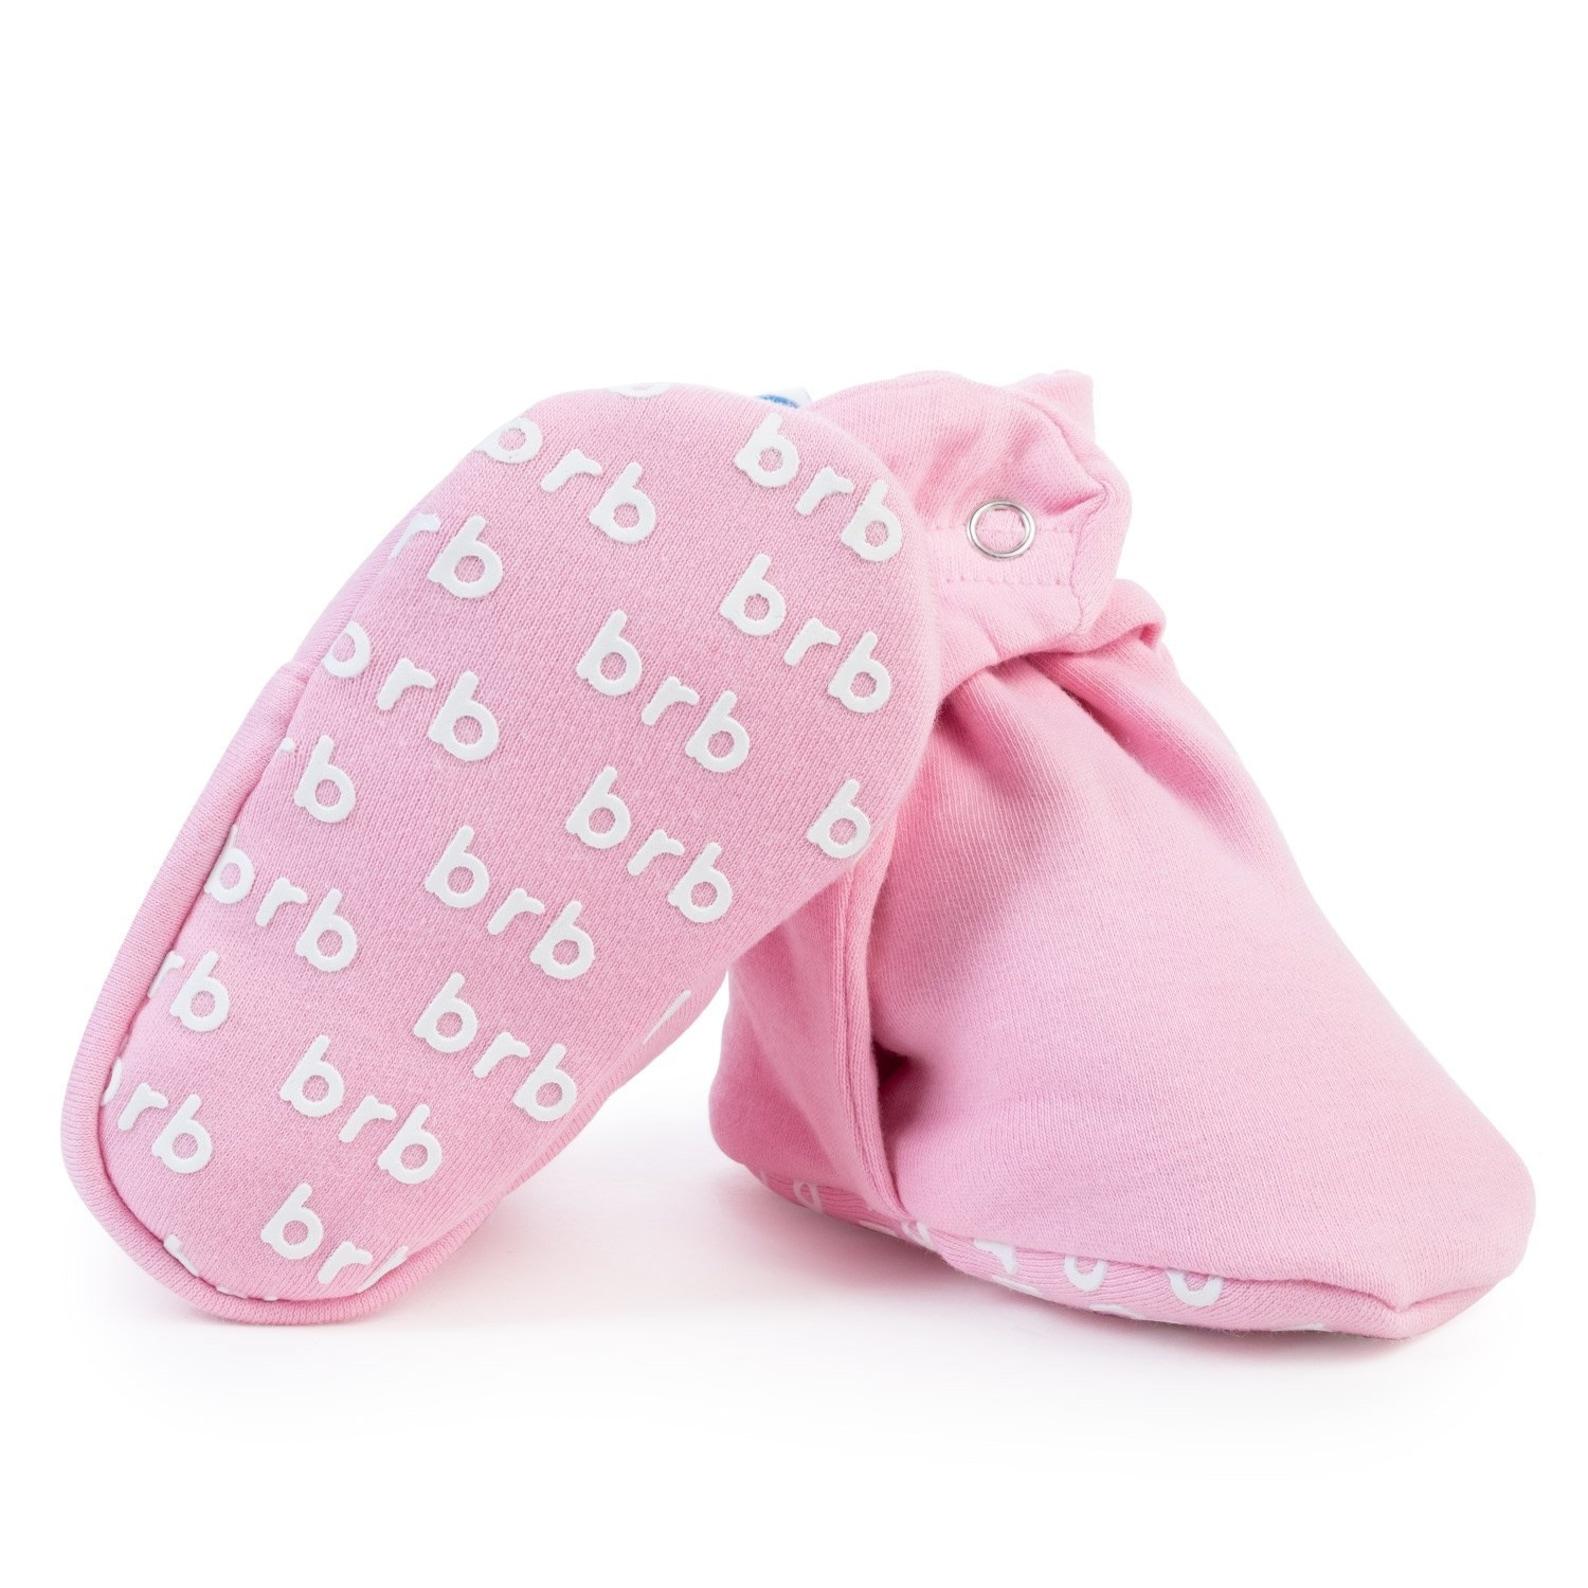 birdrock baby organic cotton booties: ballet pink | lightweight booties for boys & girls